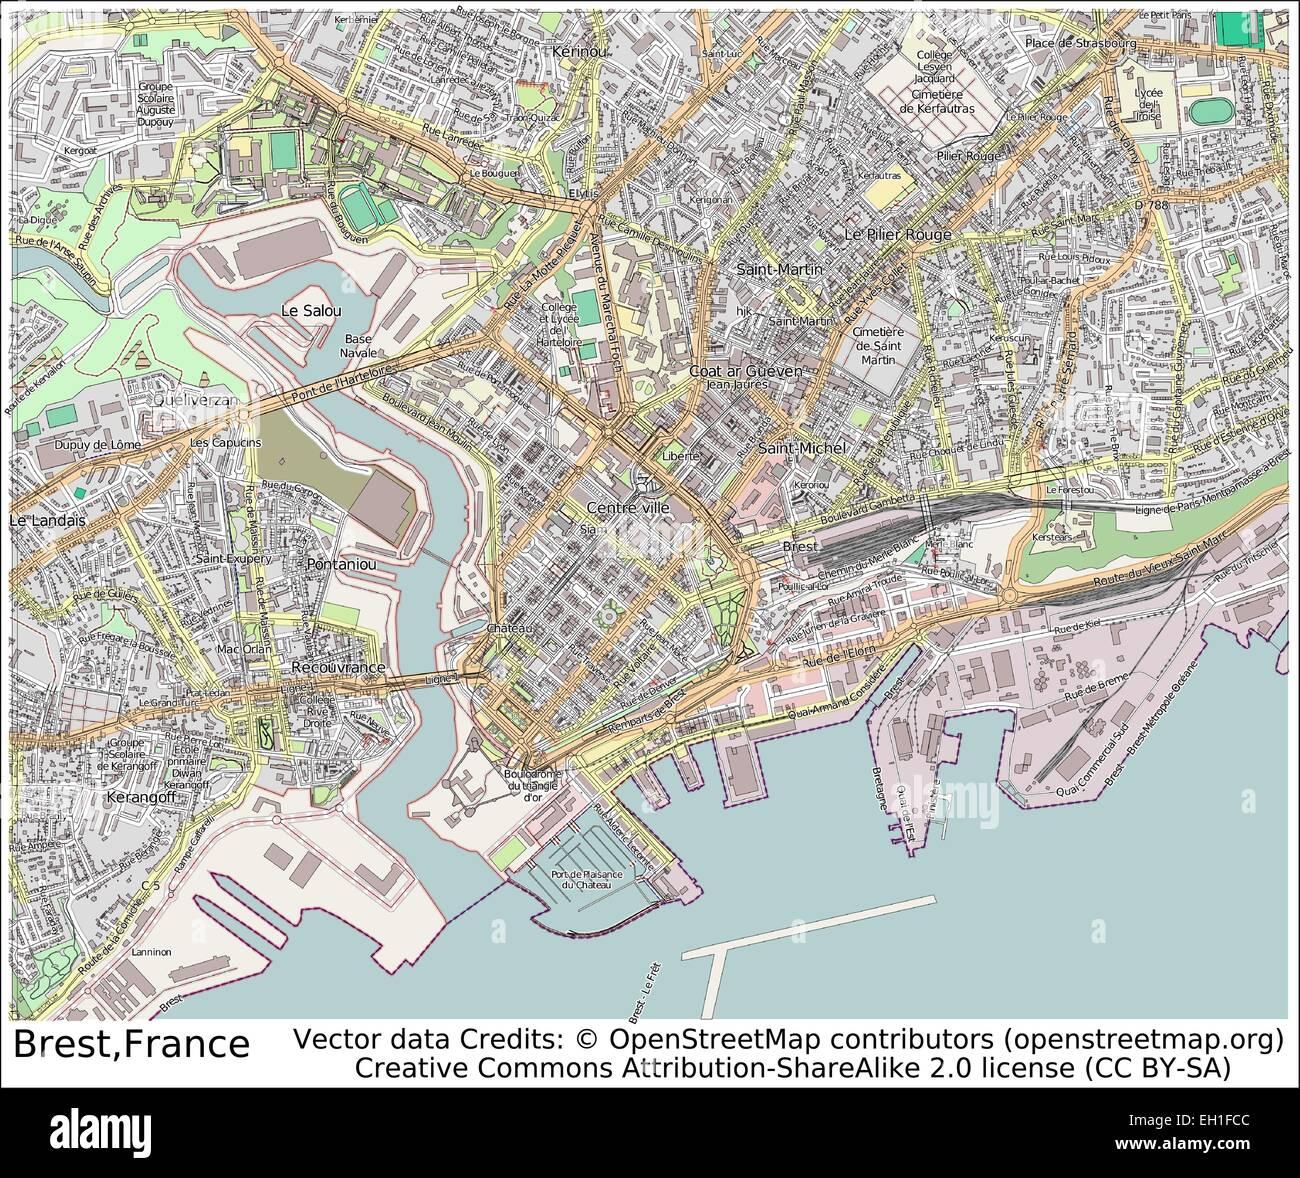 Brest France city map Stock Vector Art Illustration Vector Image